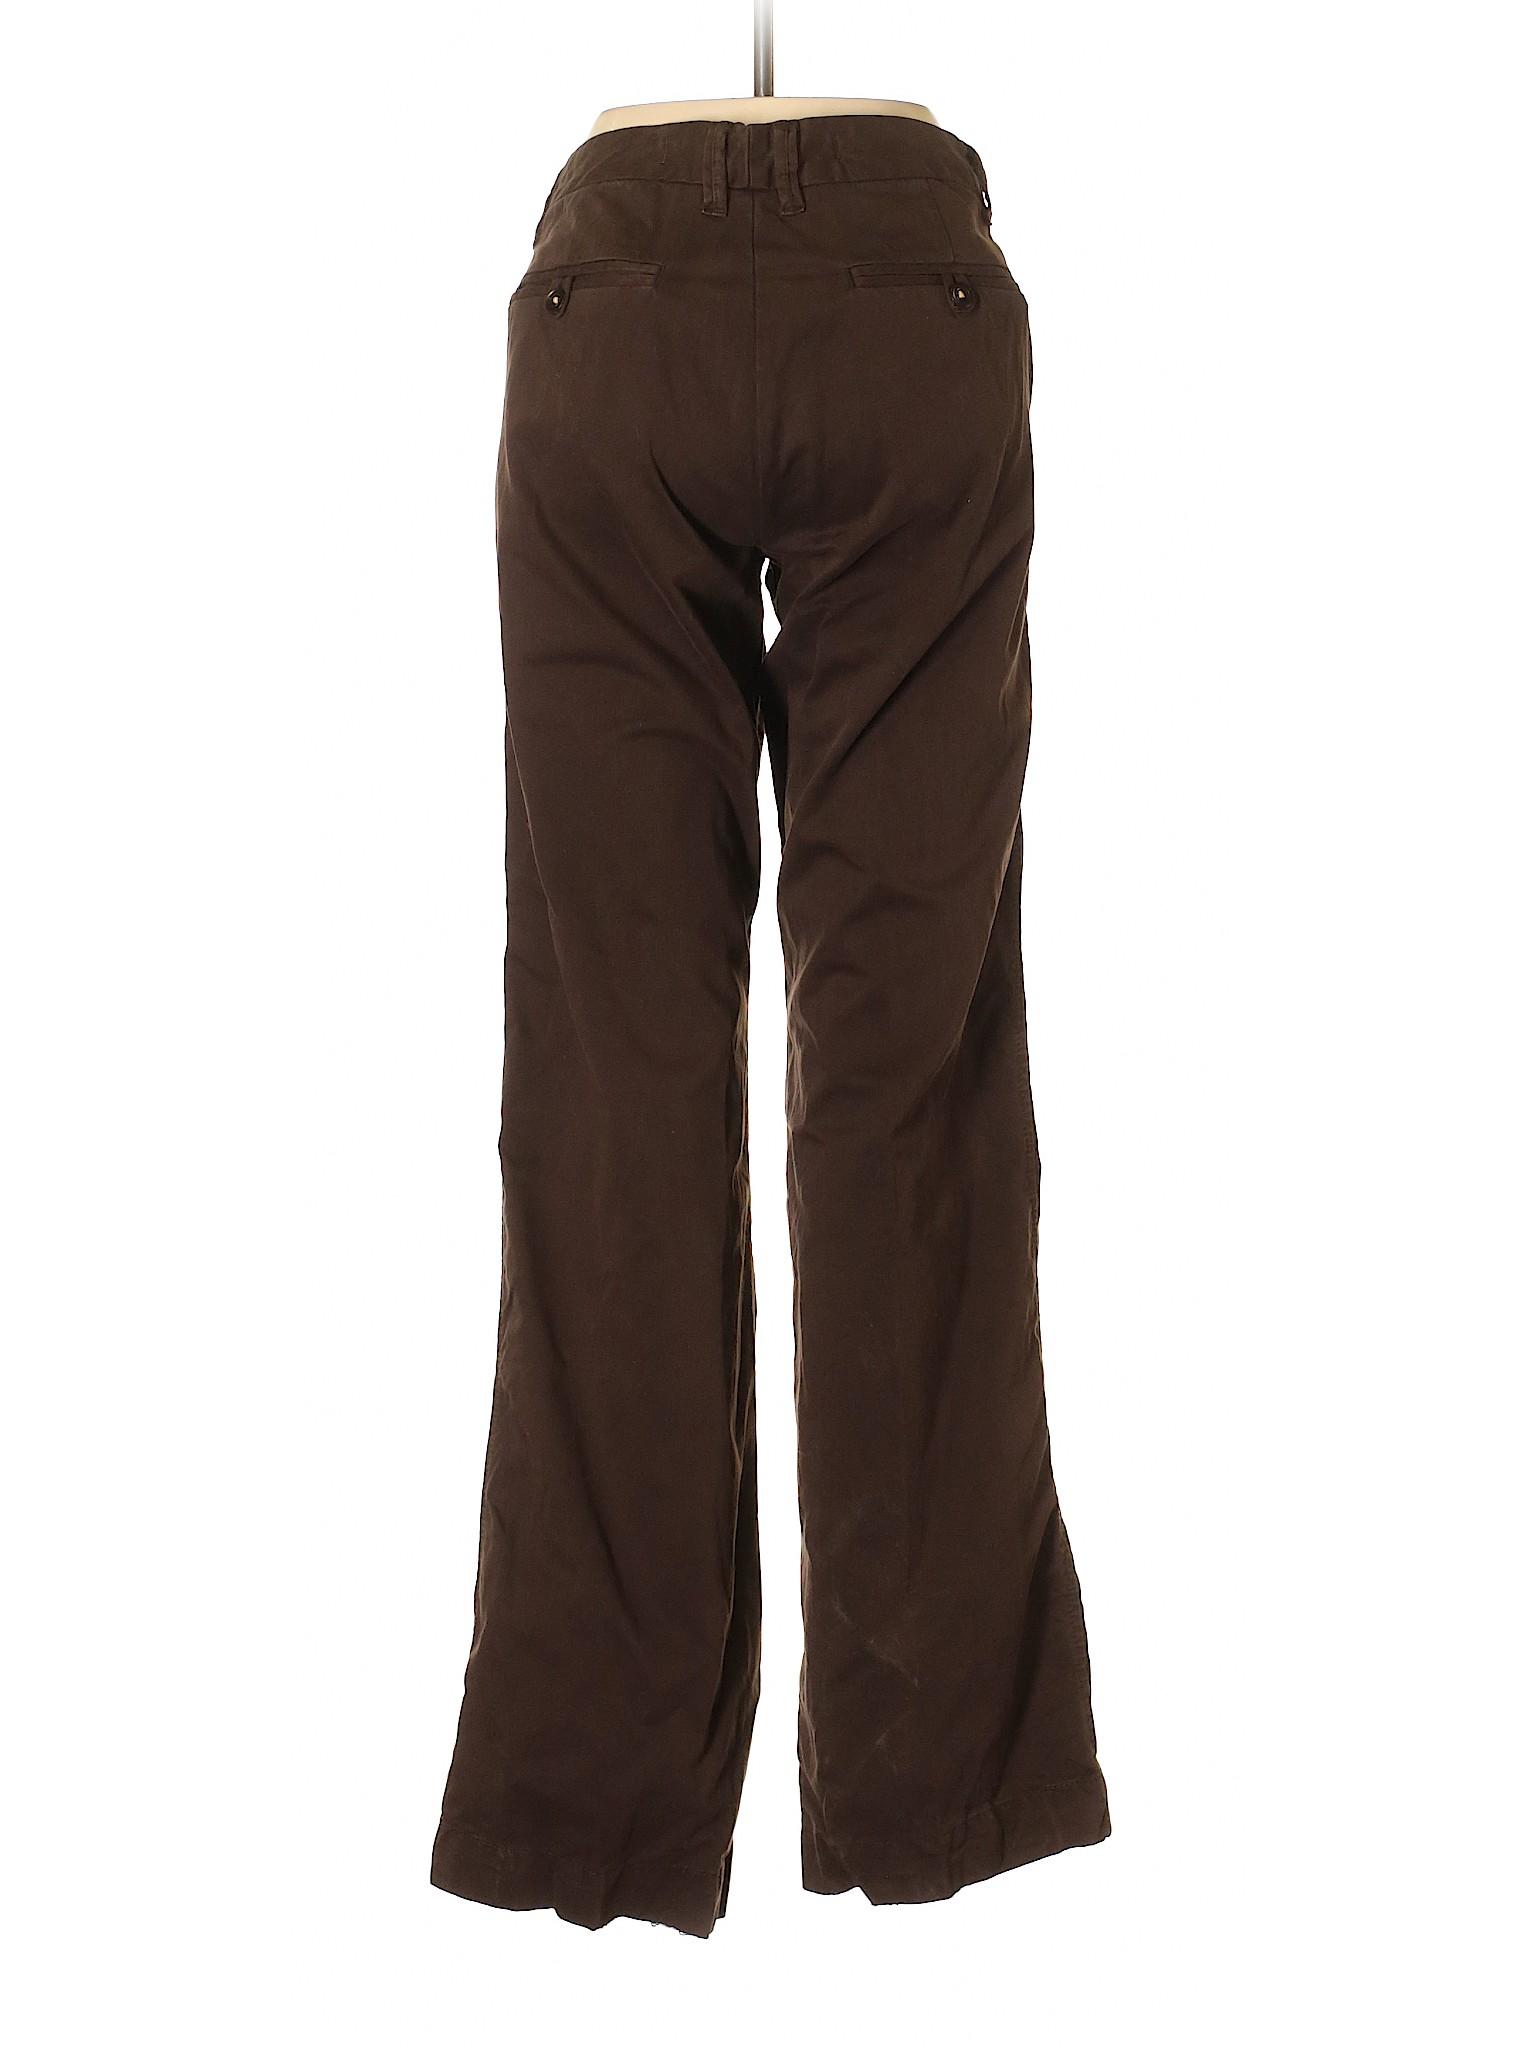 Pants Pants Casual Gap Casual Leisure Casual Pants Gap winter Leisure winter Leisure winter Leisure Gap xZwY6aqA